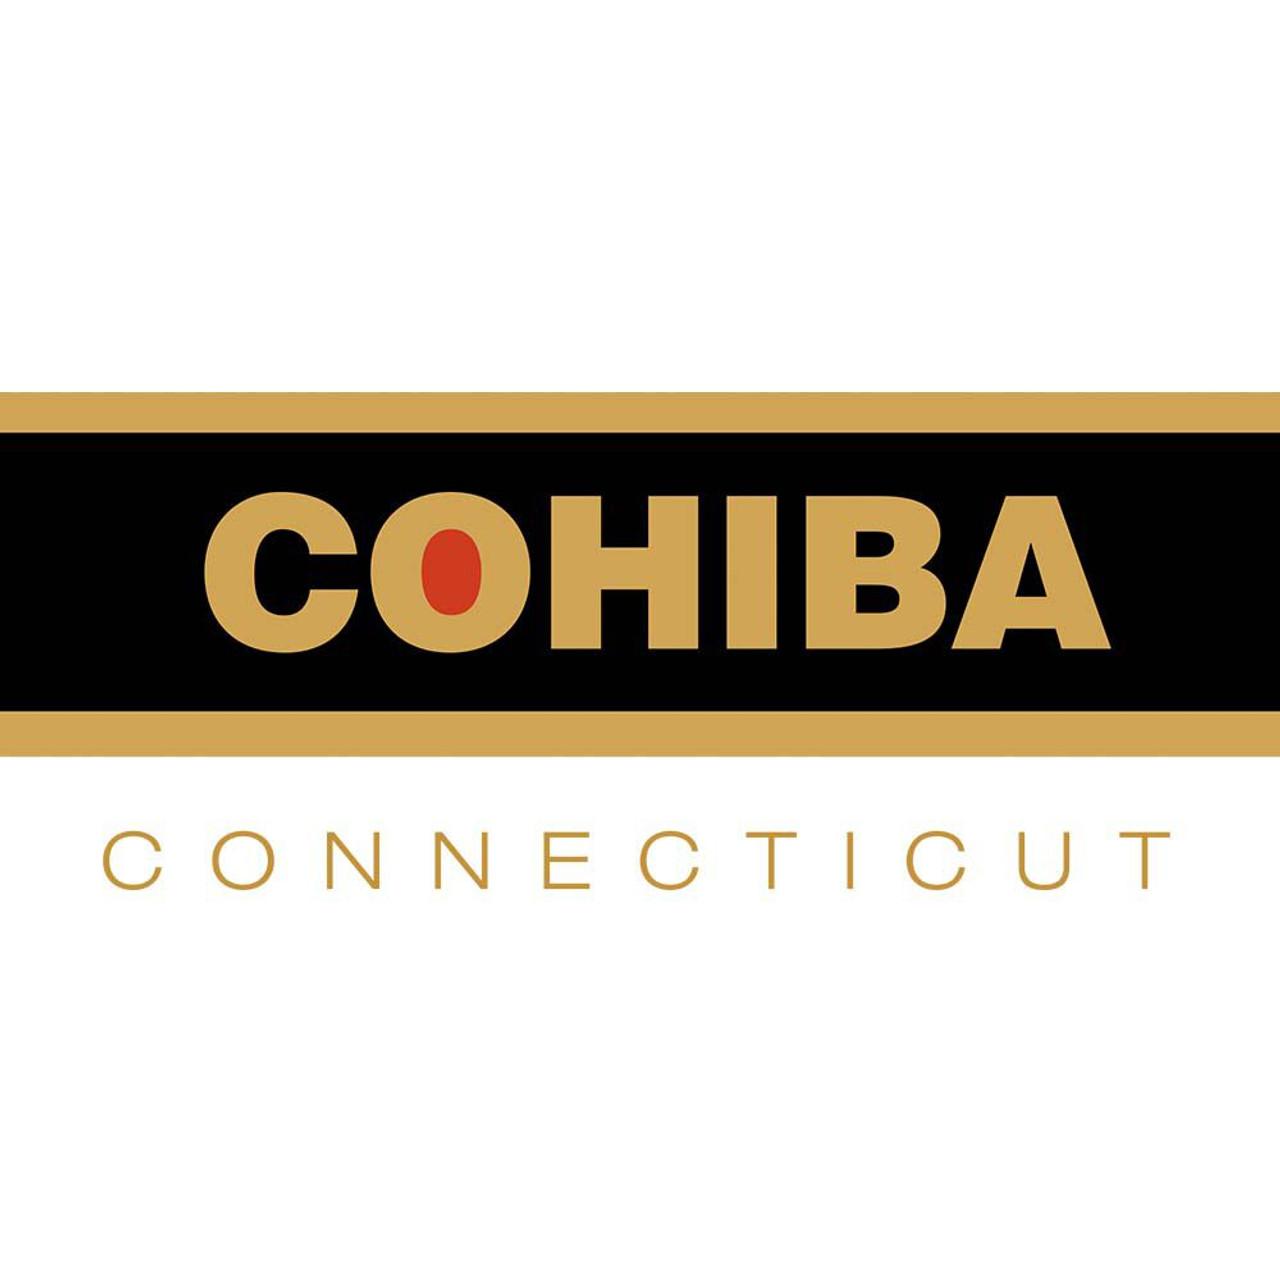 Cohiba Connecticut Gigante Cigars - 6.0 x 60 (Pack of 5)